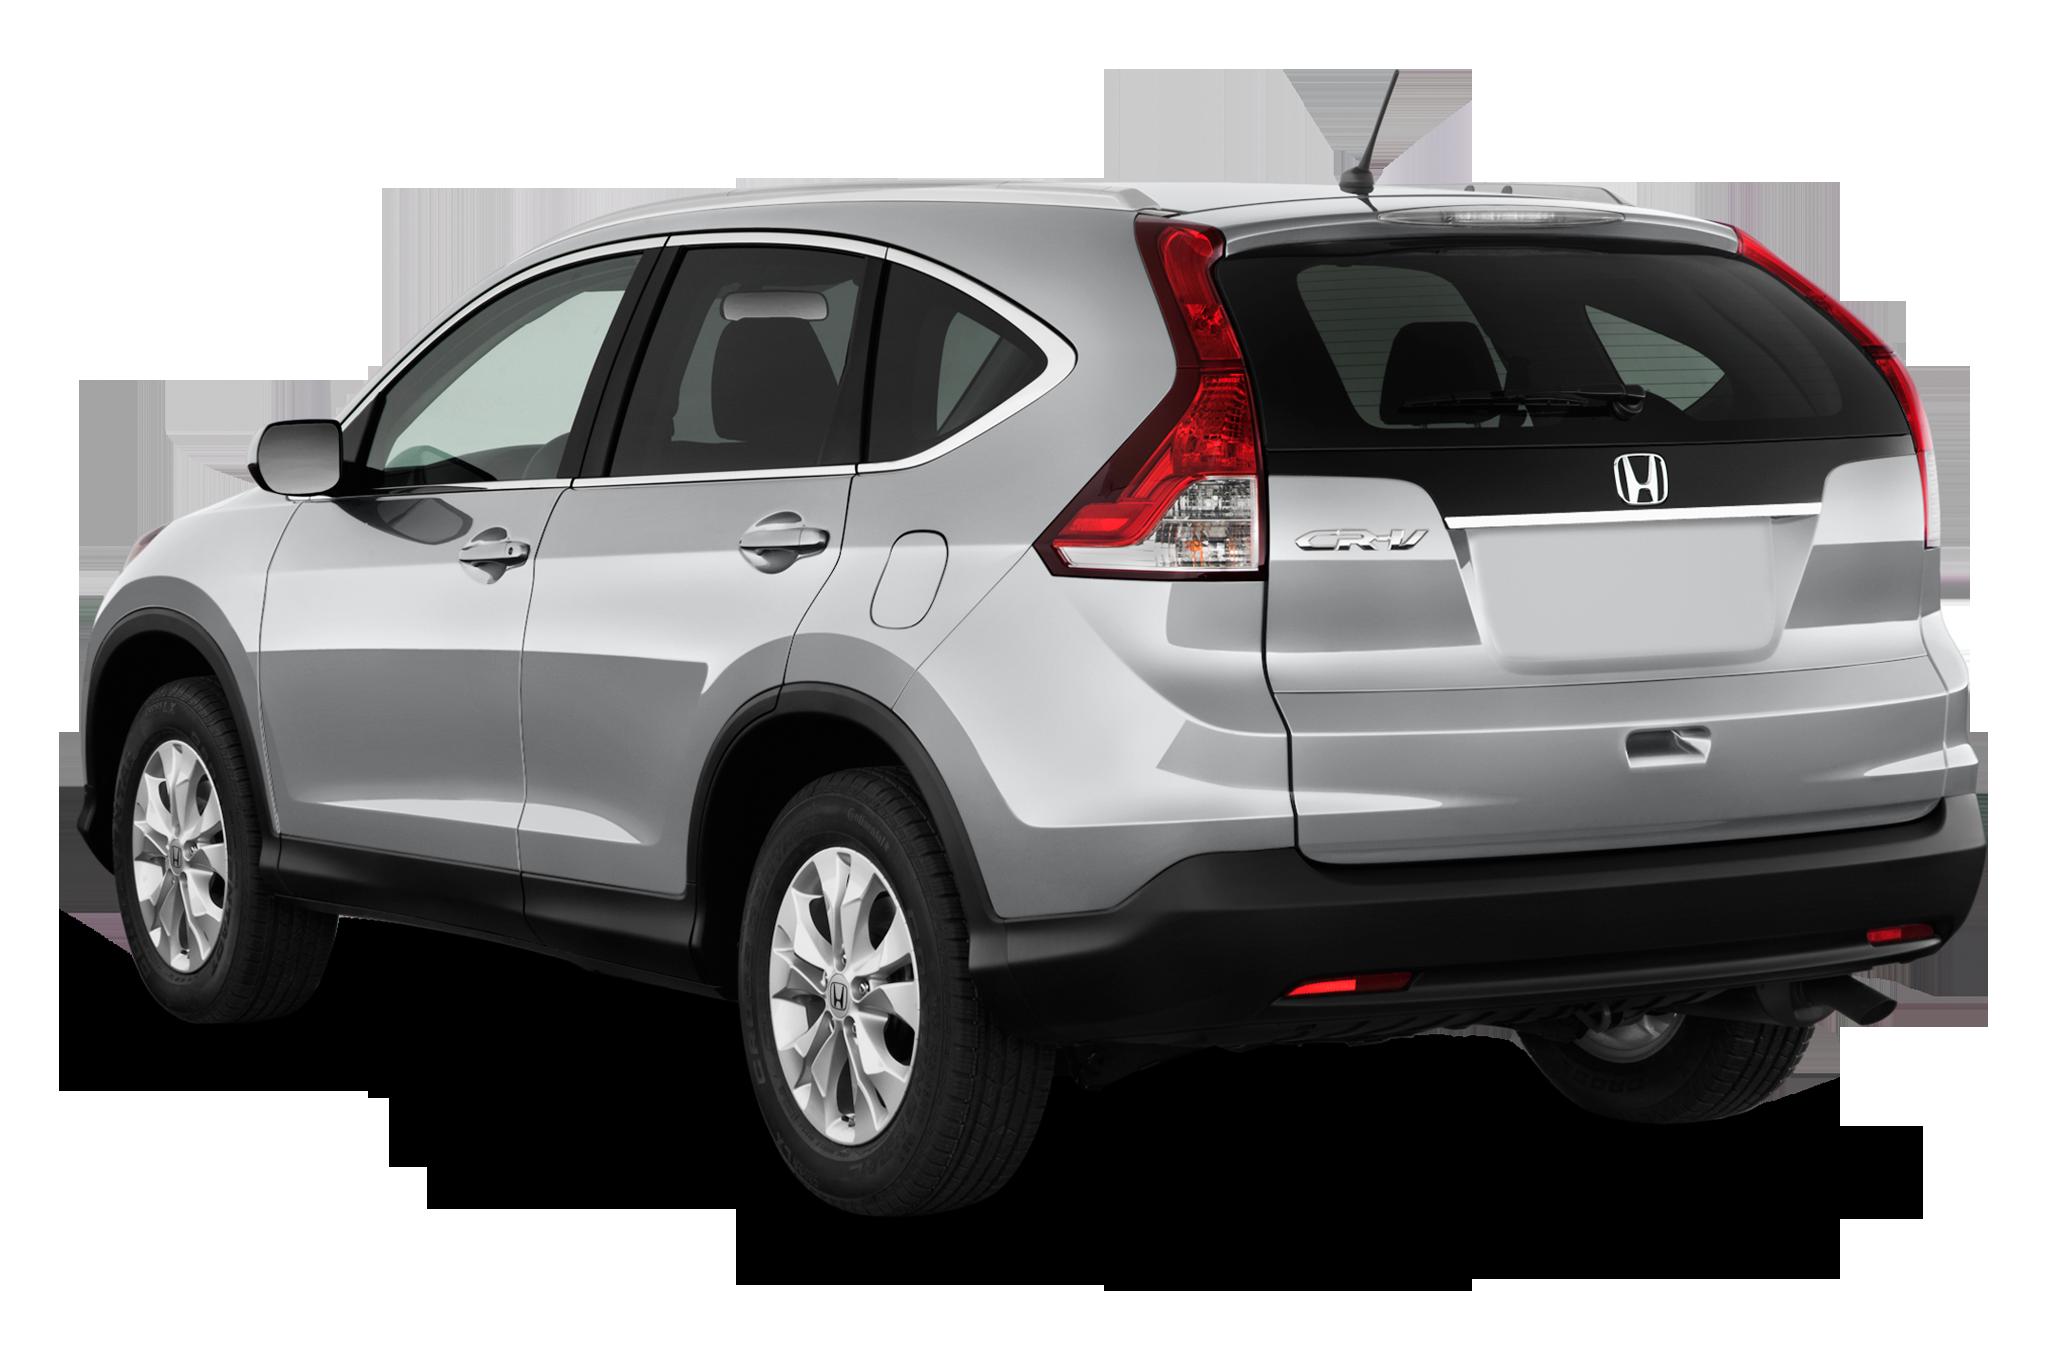 Kia Sorento Towing Capacity >> Honda 2014 Crv.html | 2017 - 2018 Cars Reviews